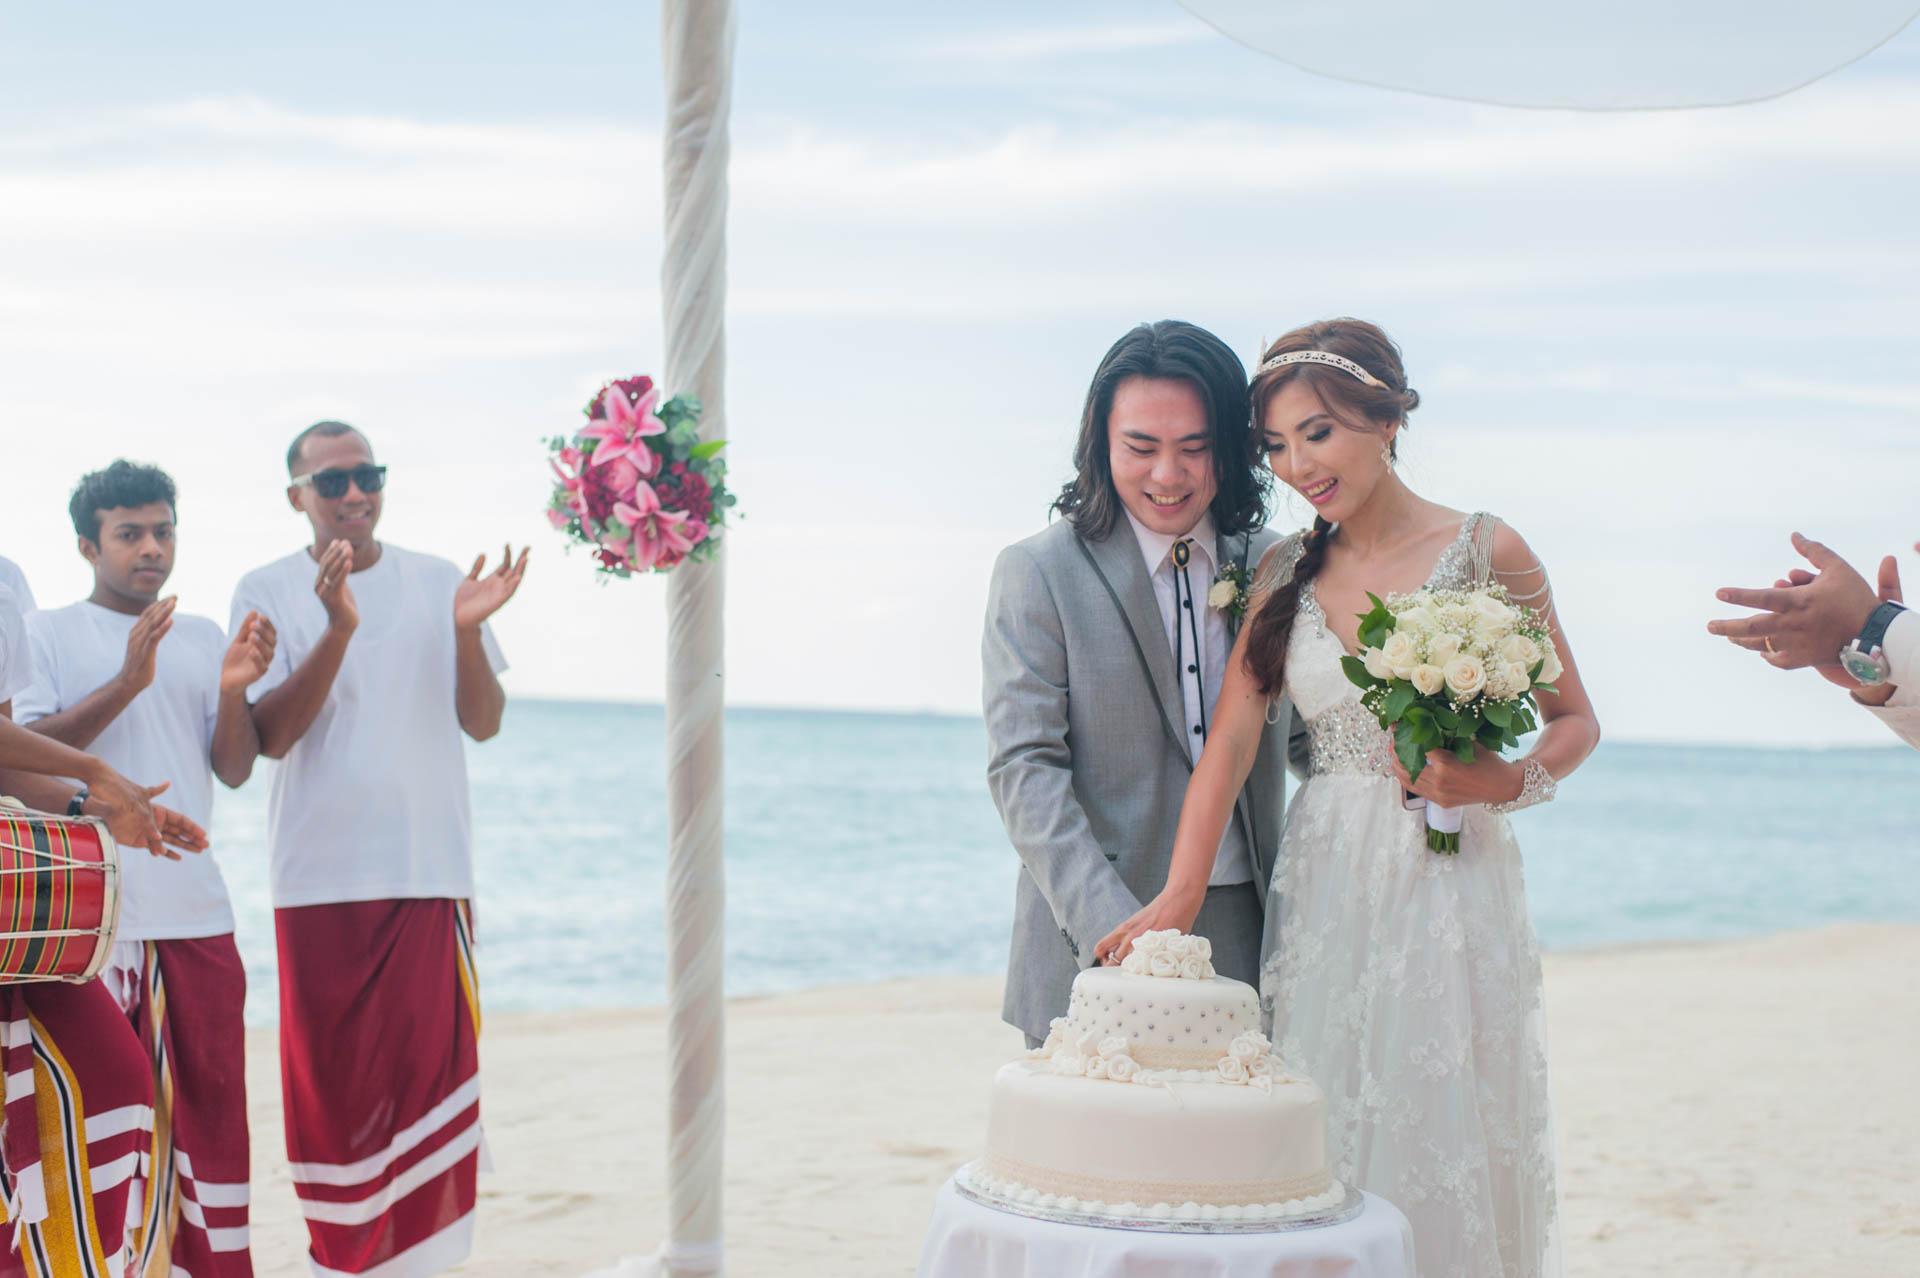 Chih Chao Yu Shan Destination Wedding at Residence Maldives 23